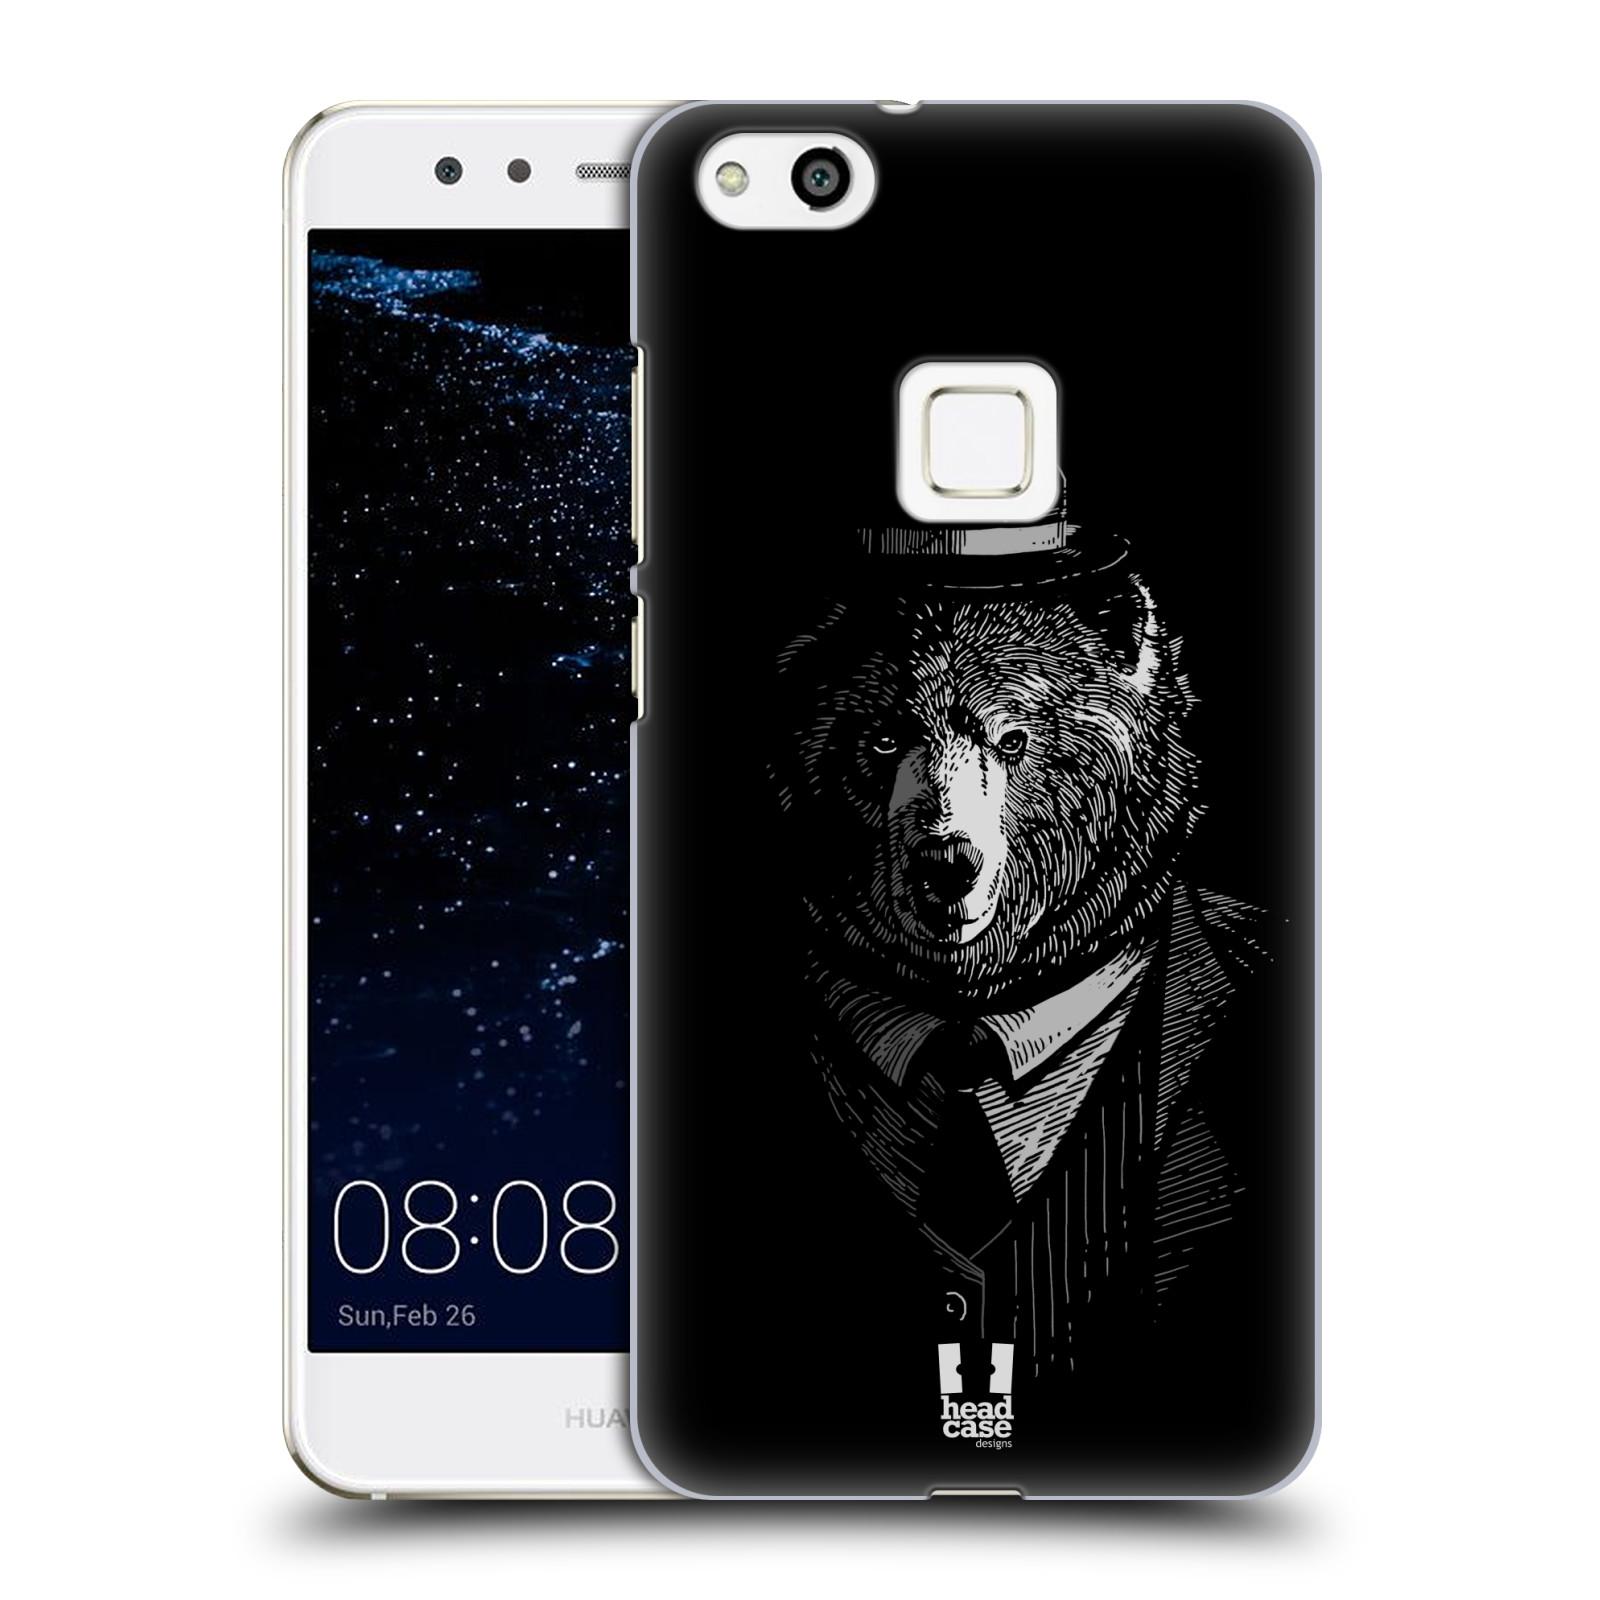 Plastové pouzdro na mobil Huawei P10 Lite Head Case - MEDVĚD V KVÁDRU (Plastový kryt či obal na mobilní telefon Huawei P10 Lite Dual SIM (LX1/LX1A))